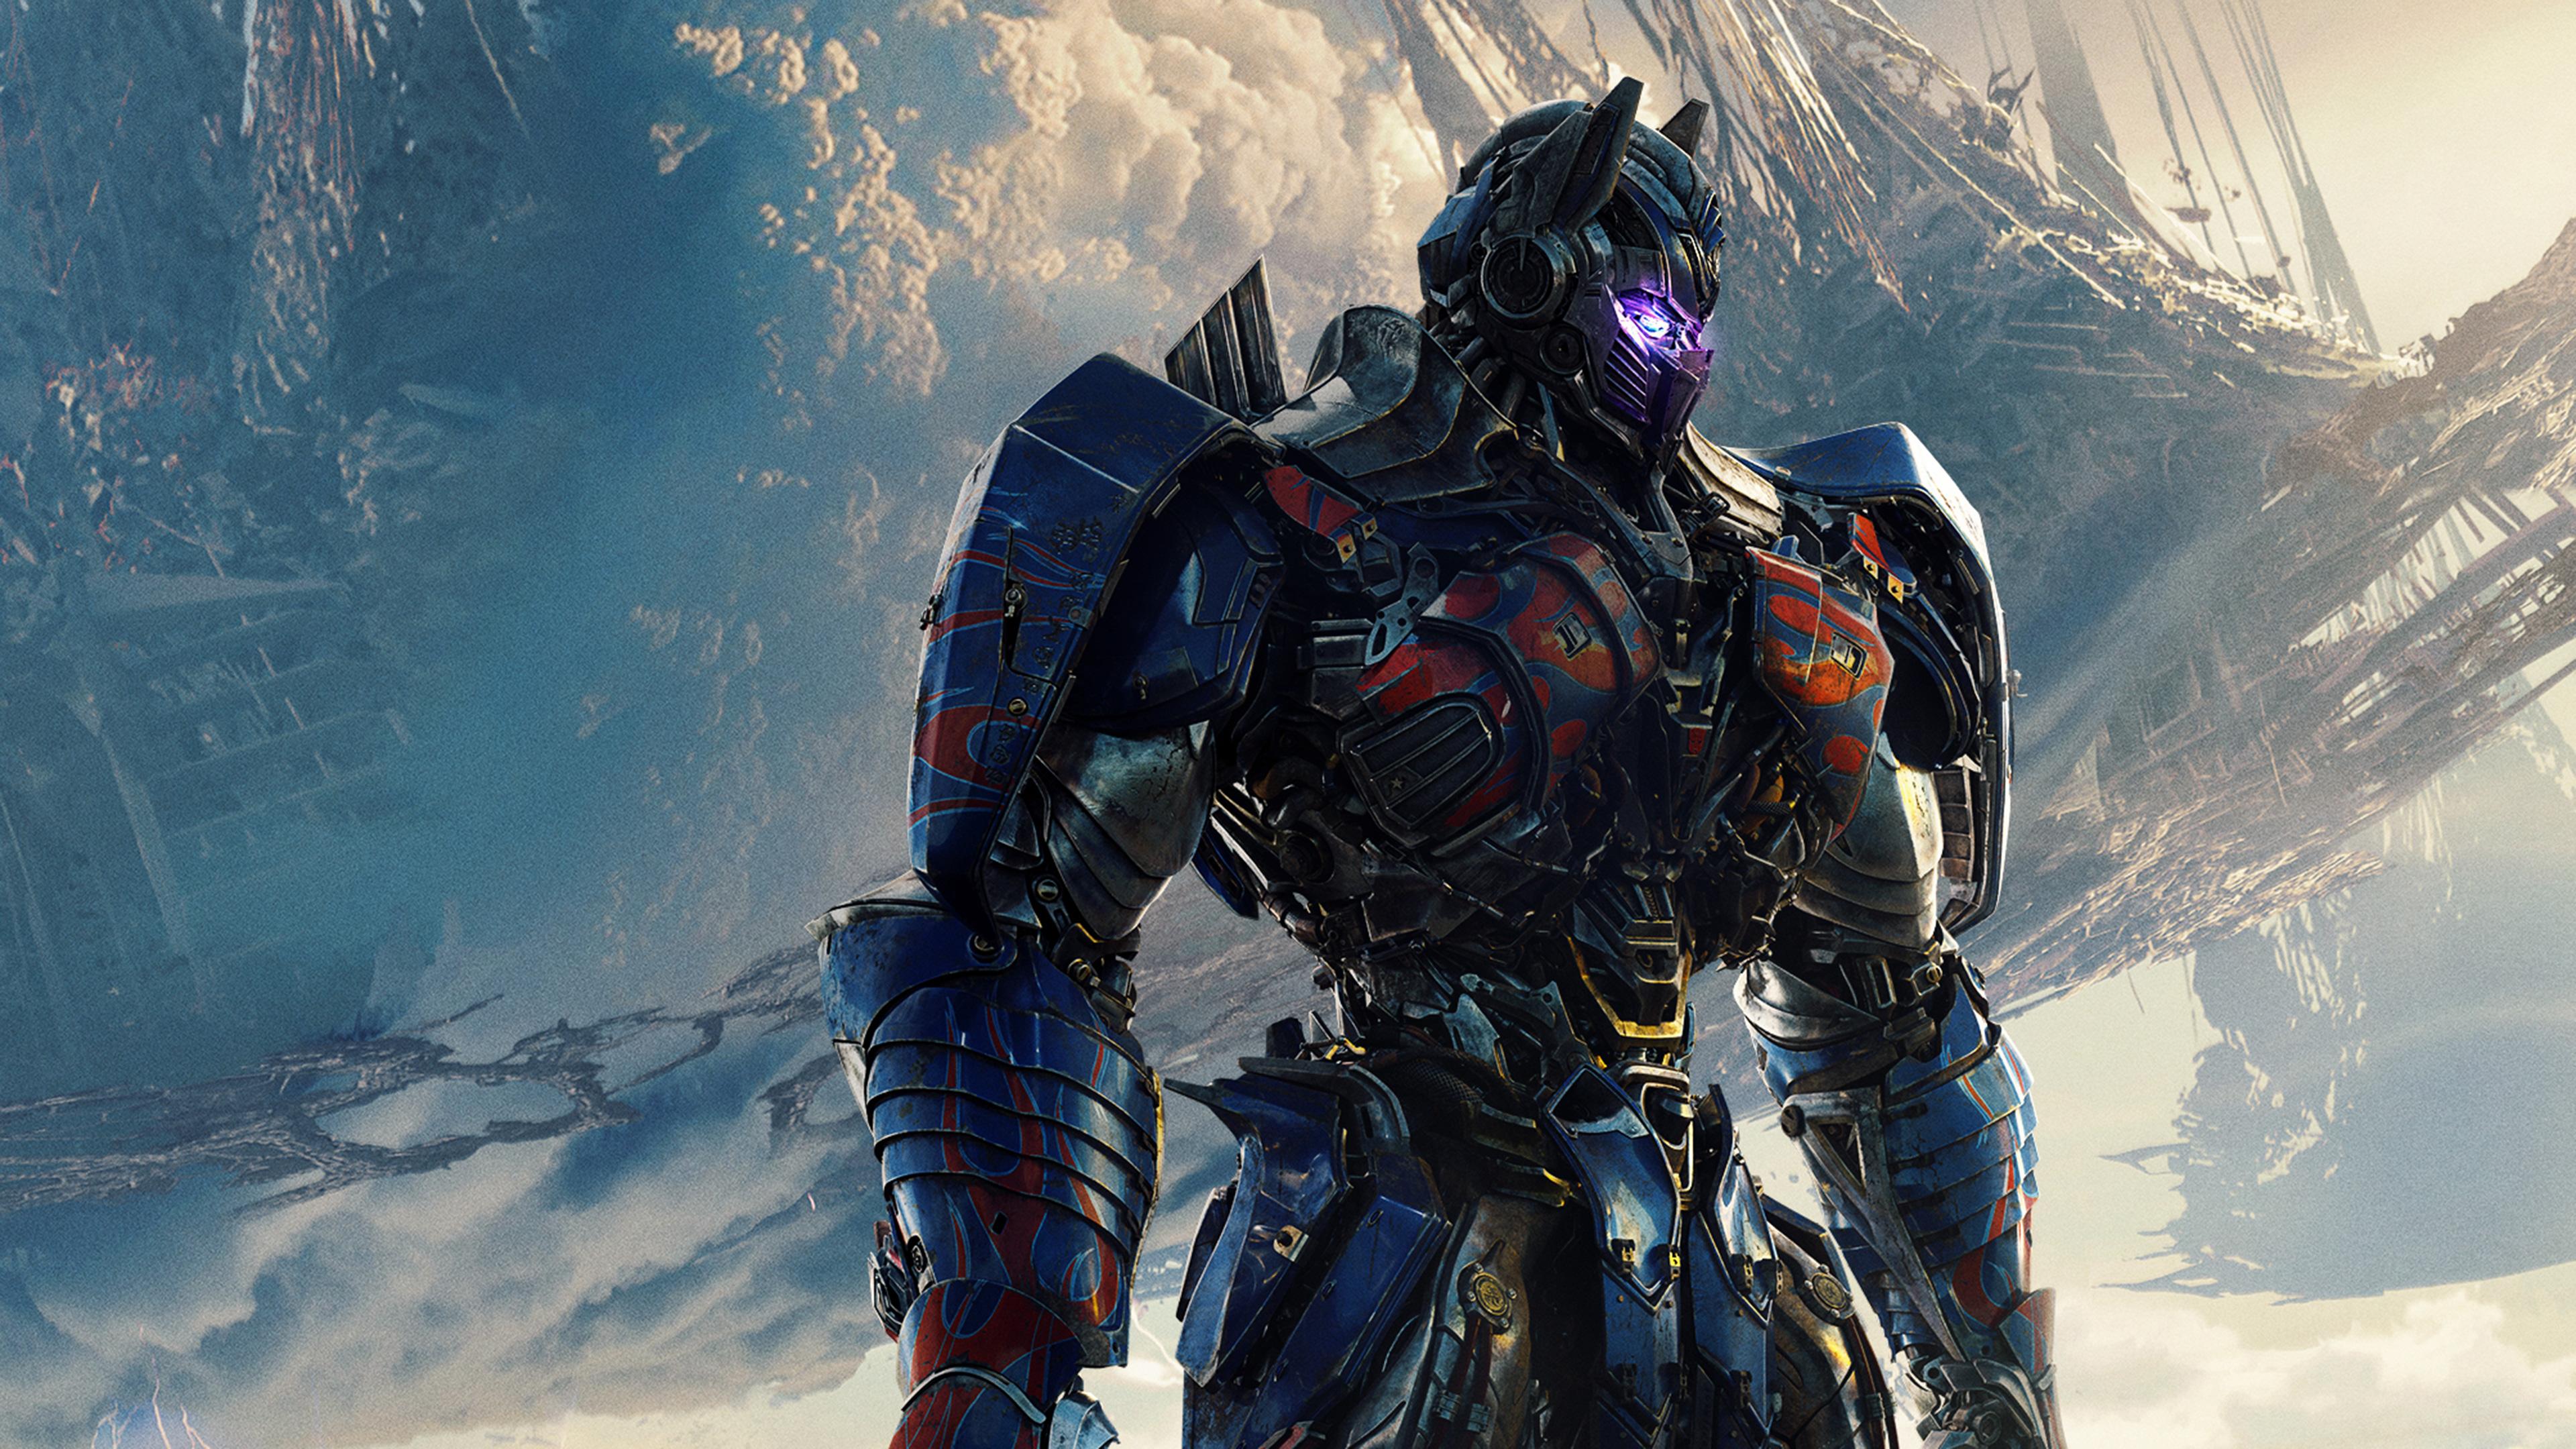 Wallpaper 4k Transformers The Last Knight 2017 Movie 4k 2017